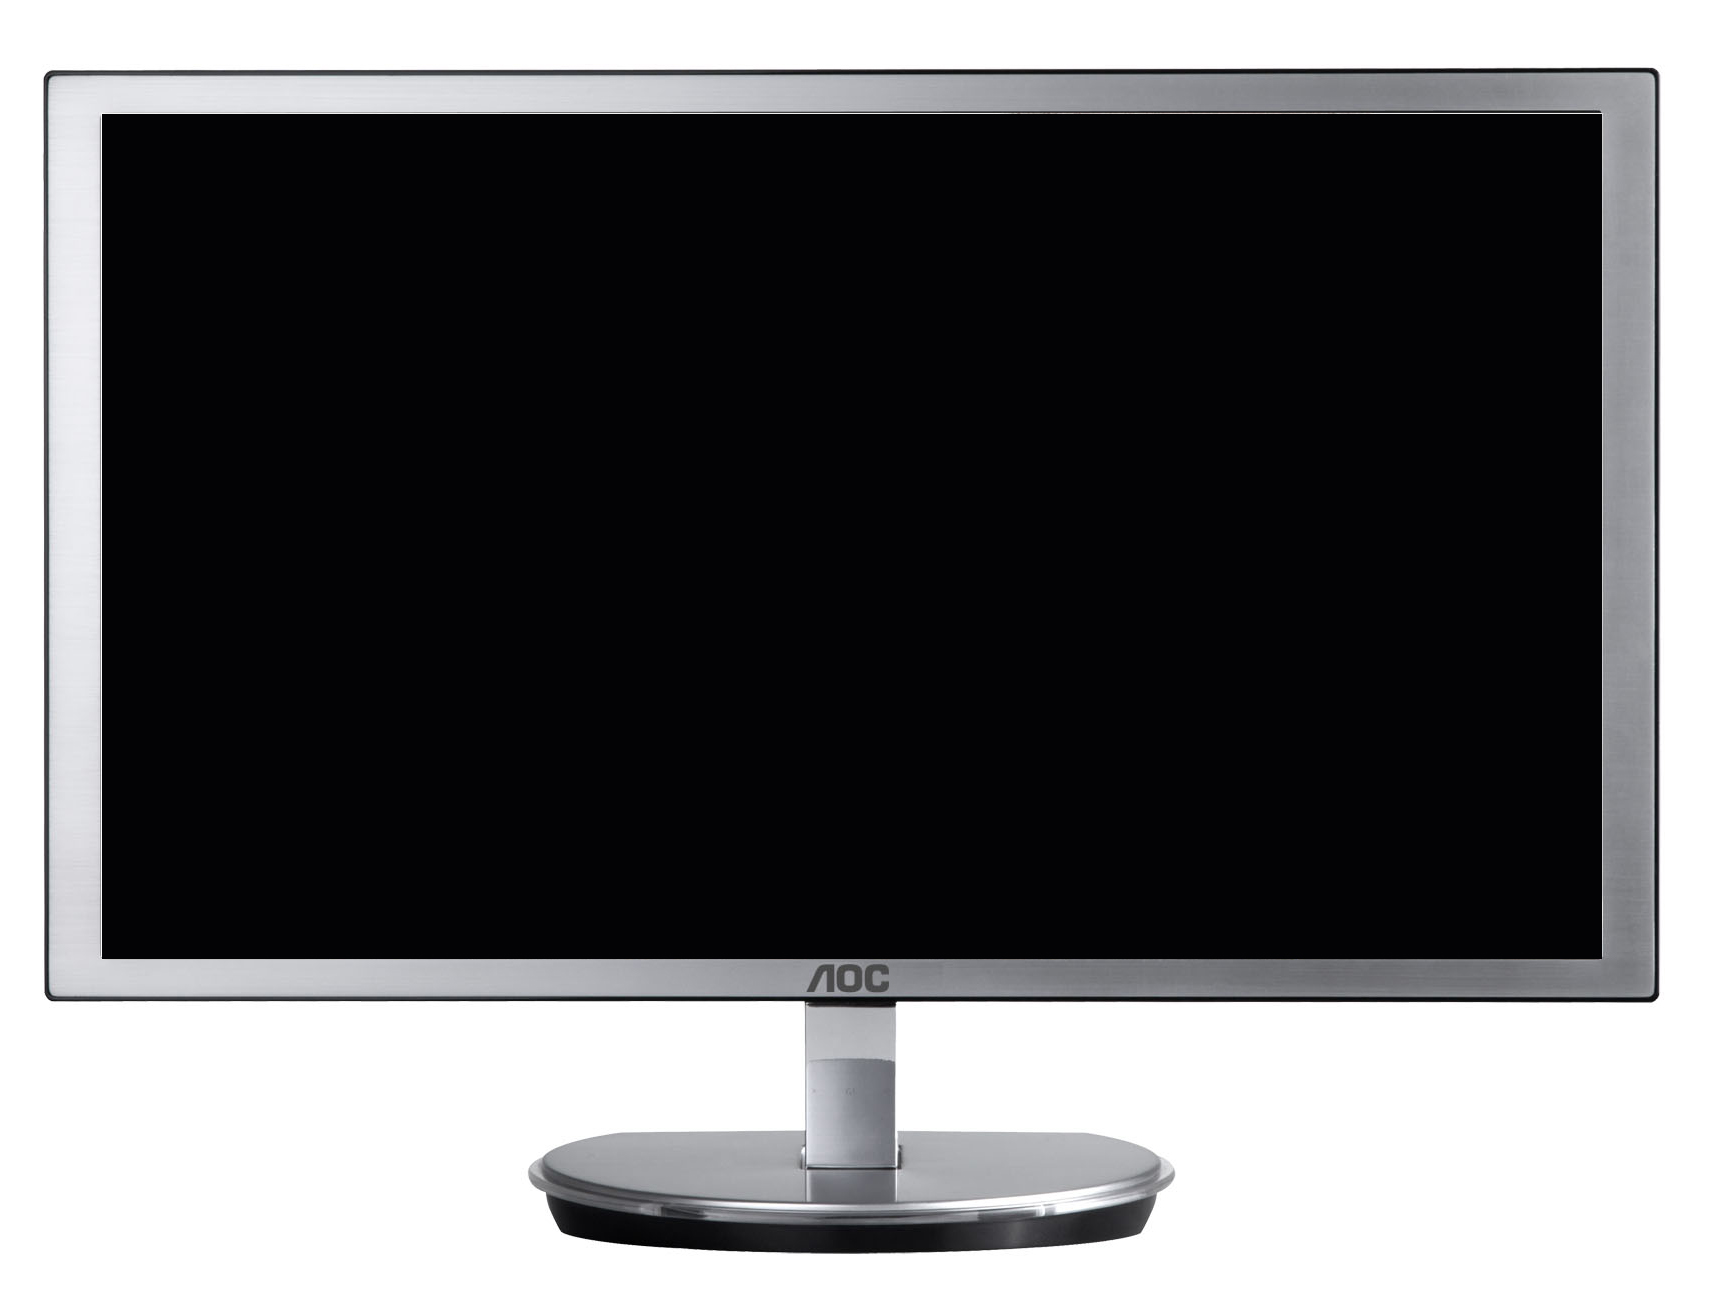 AOC i2353Ph - p�profesjonalny 23-calowy monitor IPS LED